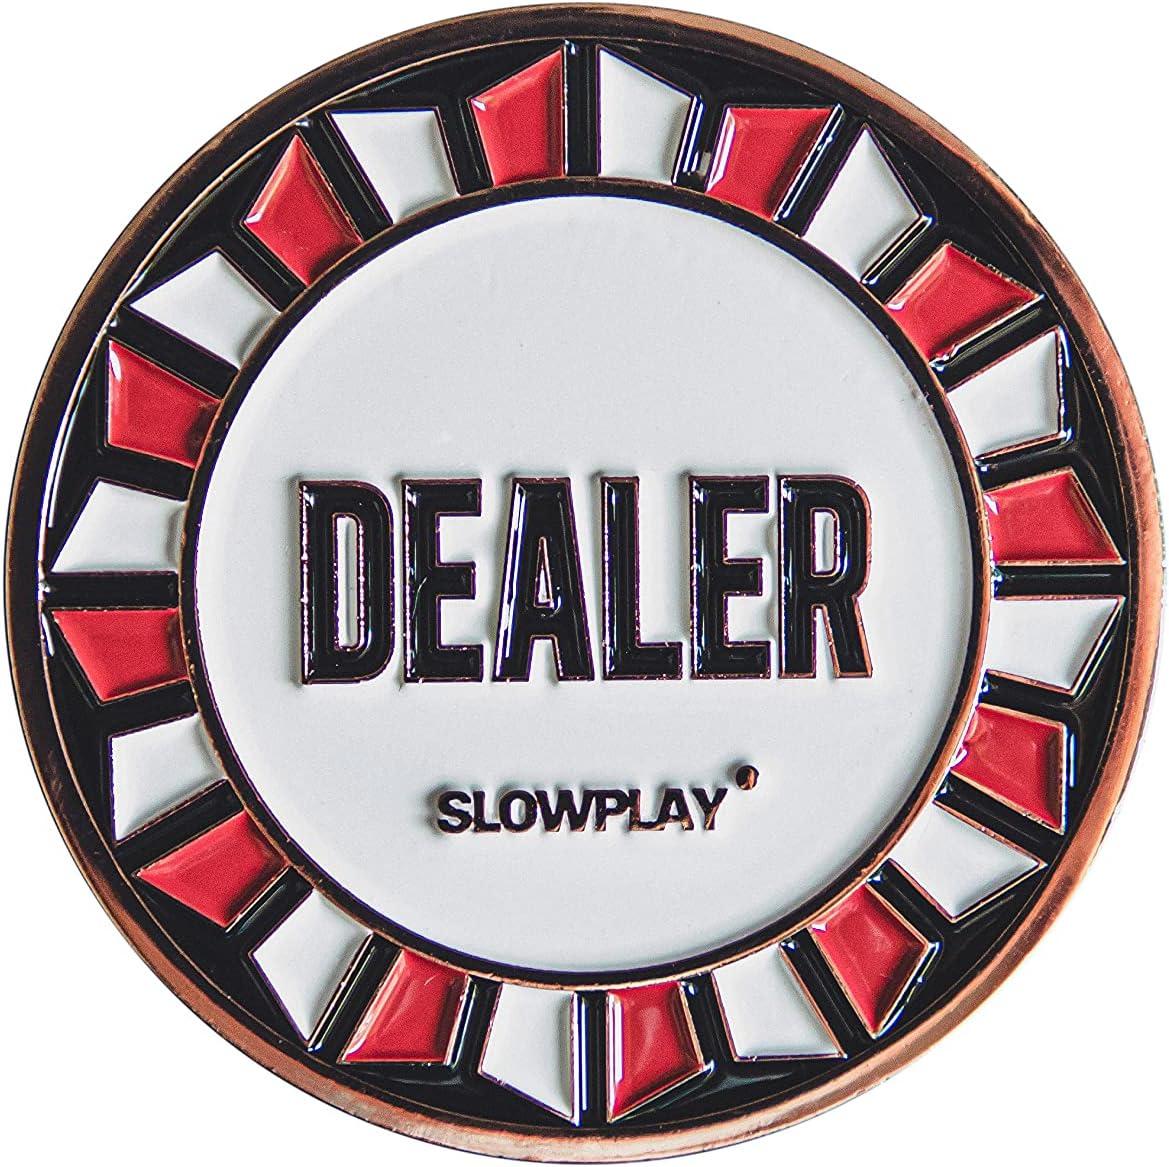 SLOWPLAY Oklahoma City Mall Casino Grade Pro Dealer Holdem Texas Popular products Button Poker for